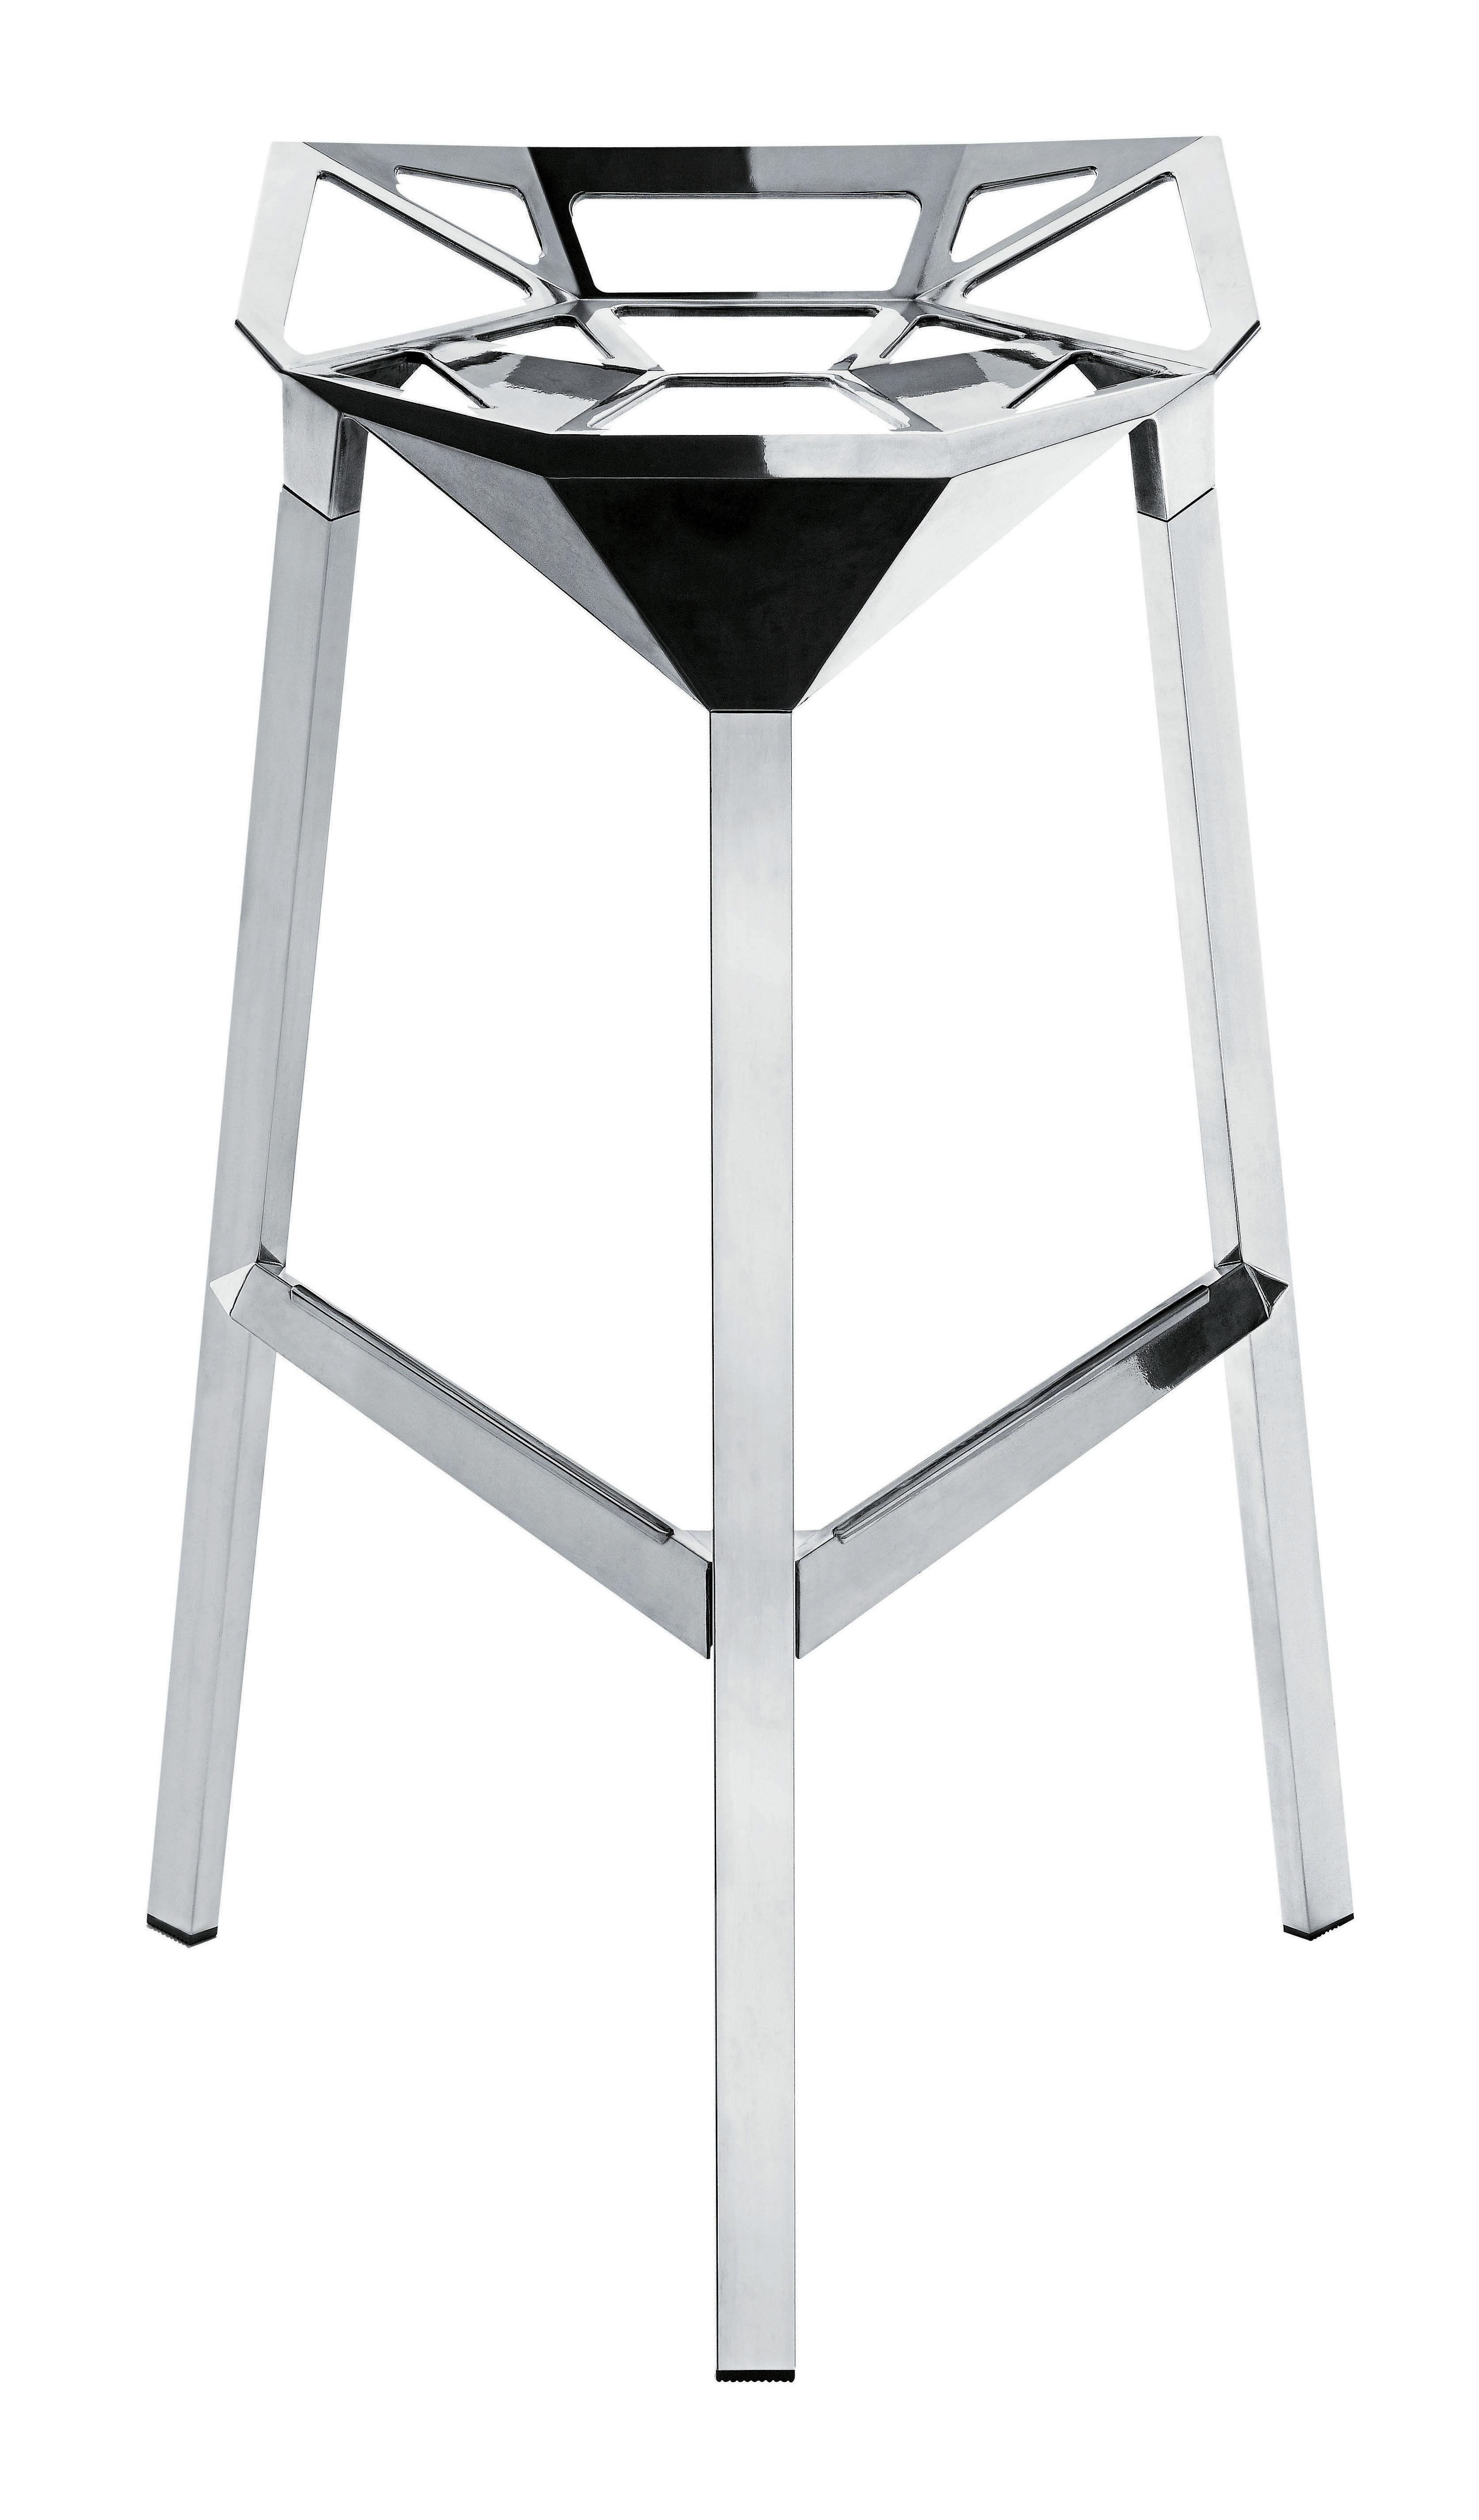 tabouret de bar stool one h 77 cm version alu poli alu. Black Bedroom Furniture Sets. Home Design Ideas